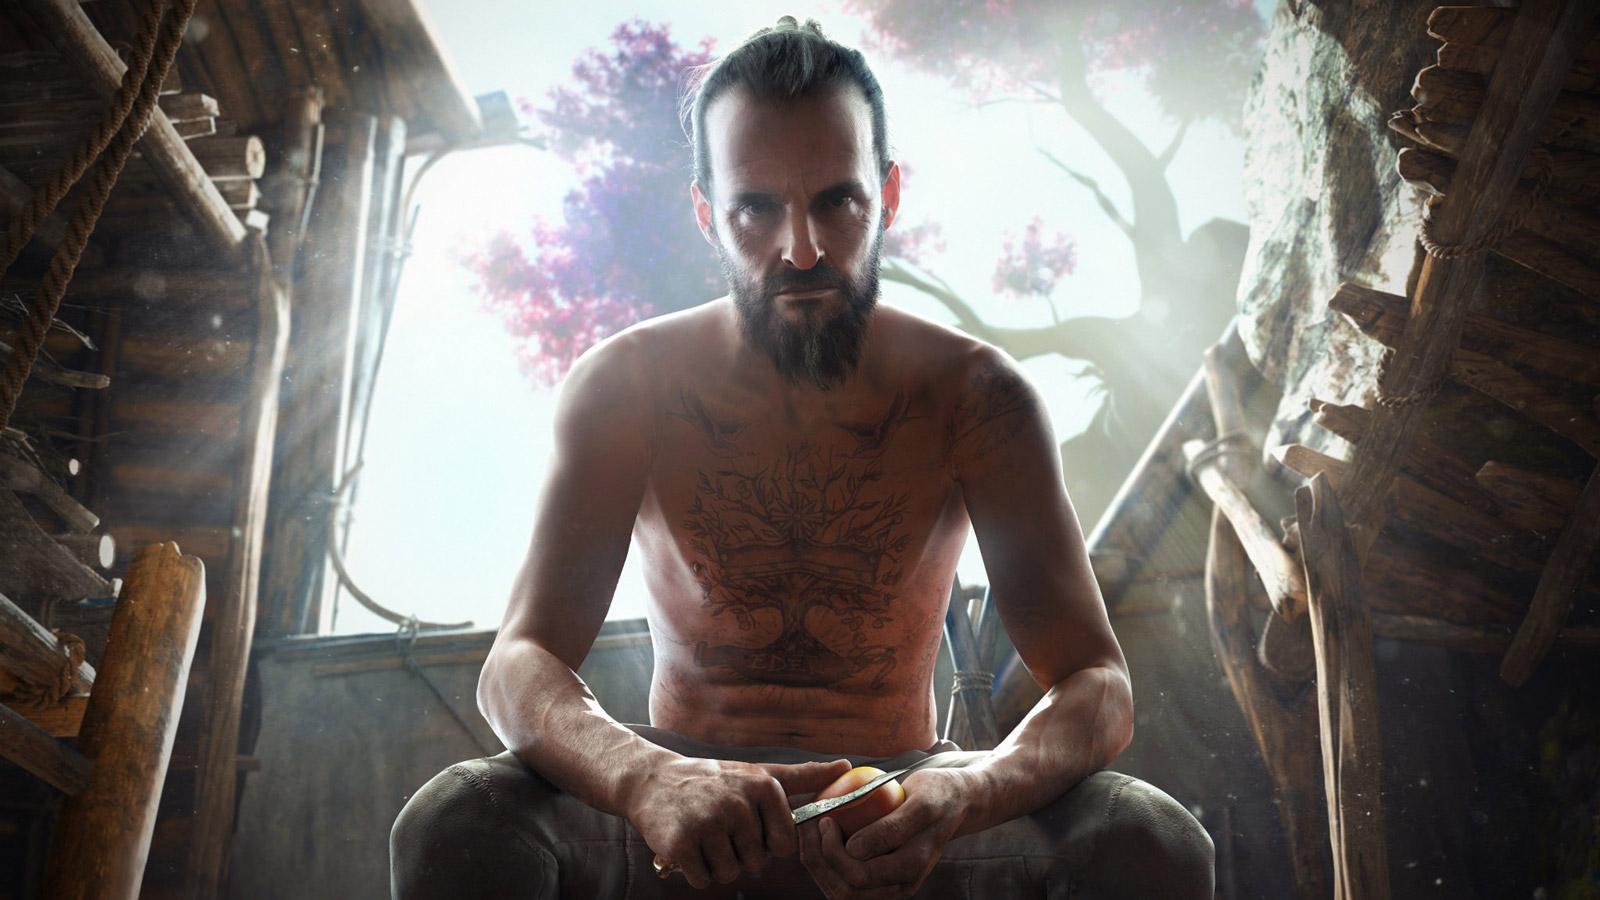 Far Cry: New Dawn Wallpaper in 1600x900